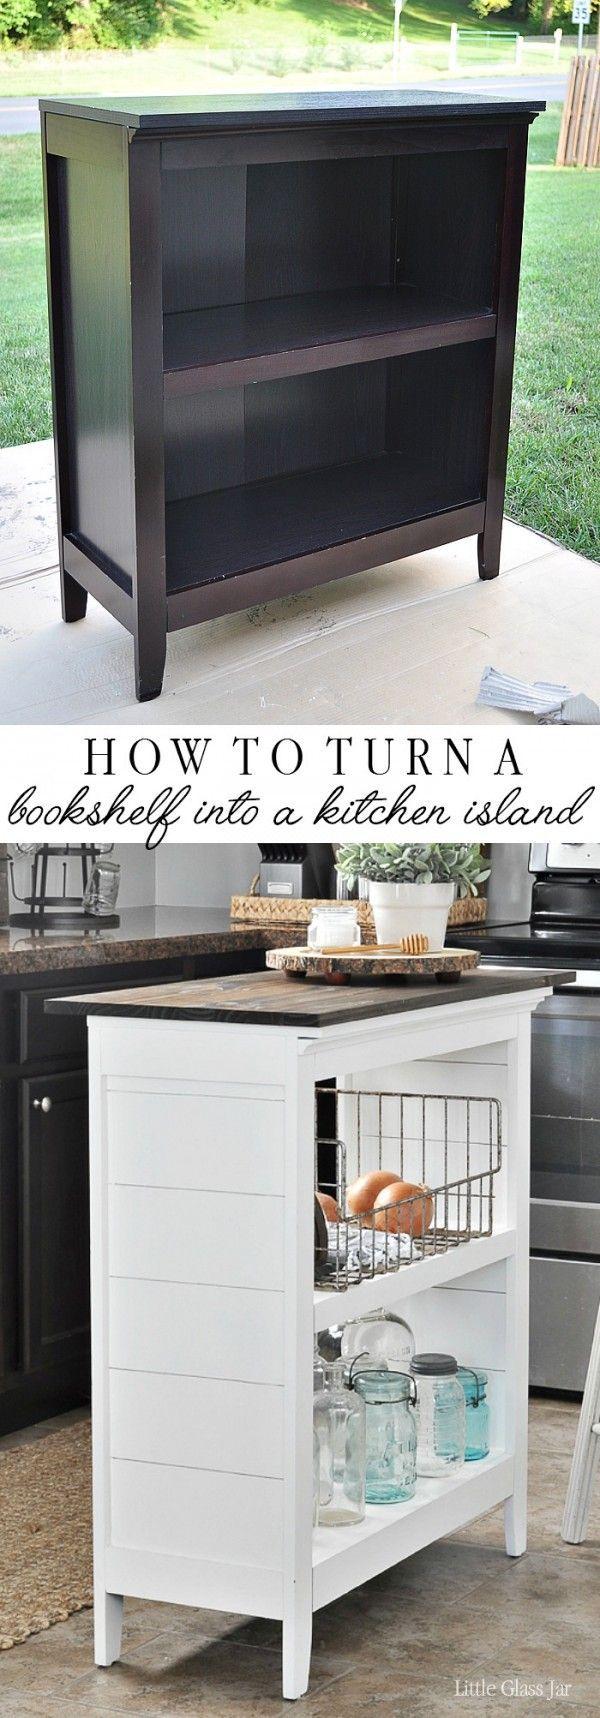 Best 25+ Build kitchen island ideas on Pinterest | Diy kitchen island, Build  kitchen island diy and Kitchen island without wheels